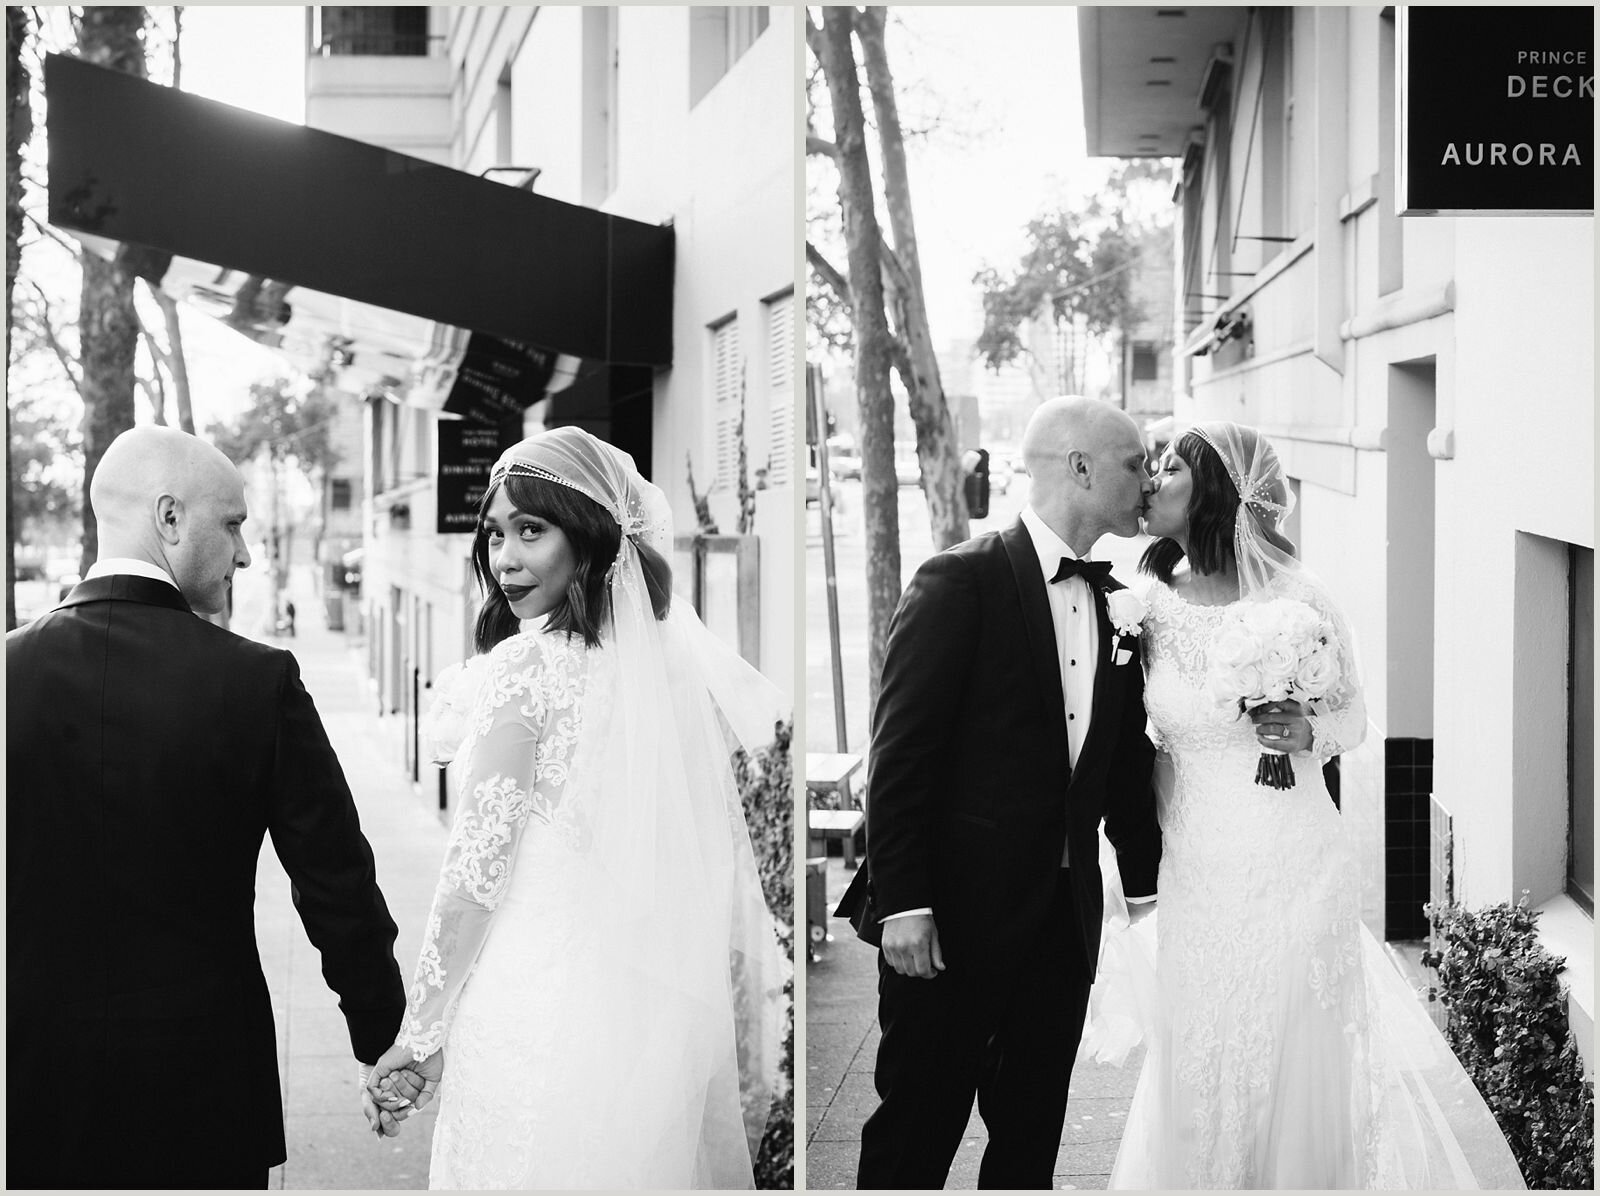 joseph_koprek_wedding_melbourne_the_prince_deck_0034.jpg